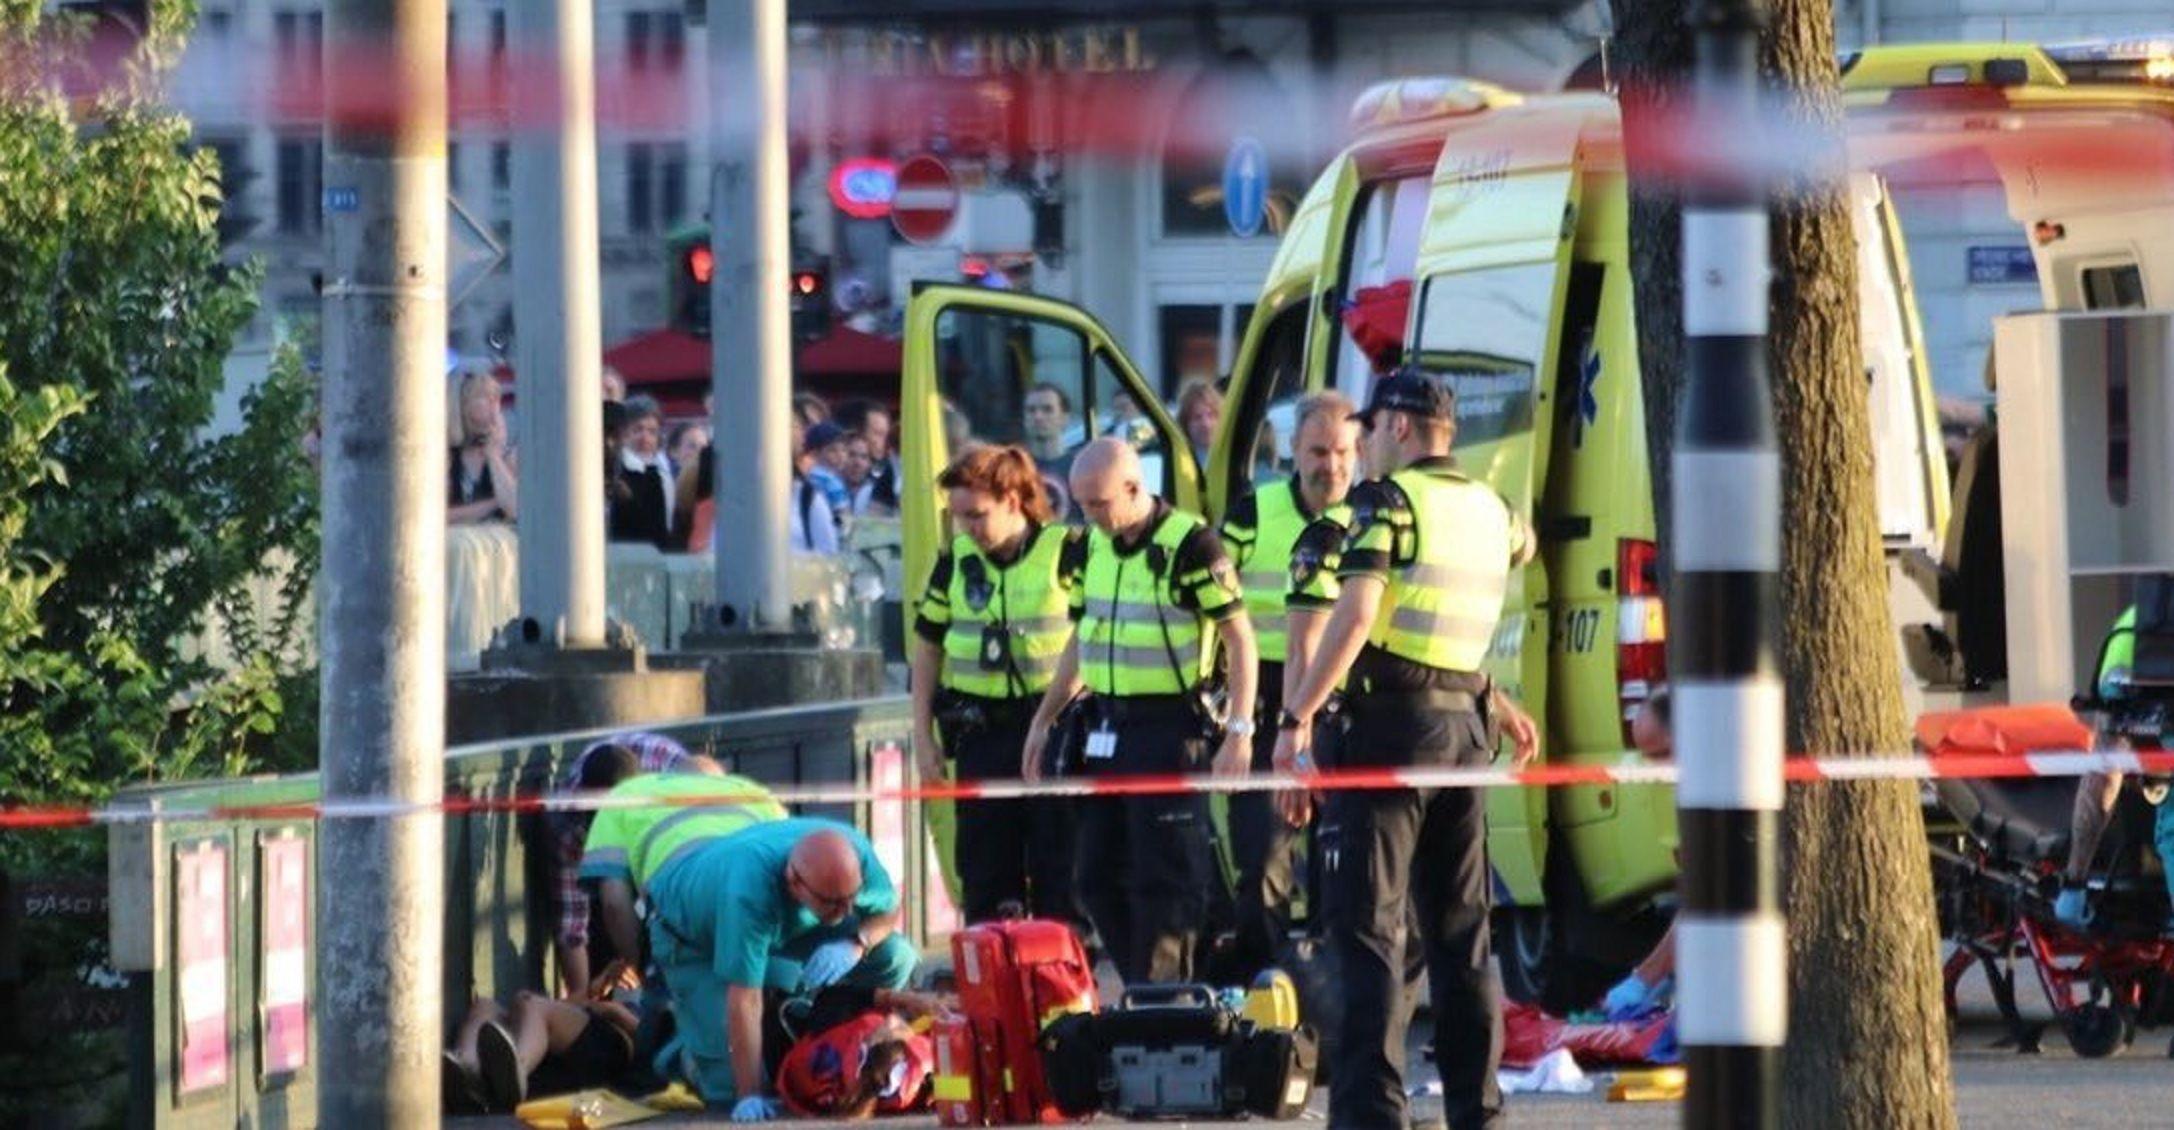 Un auto atropelló a cinco personas en Amsterdam